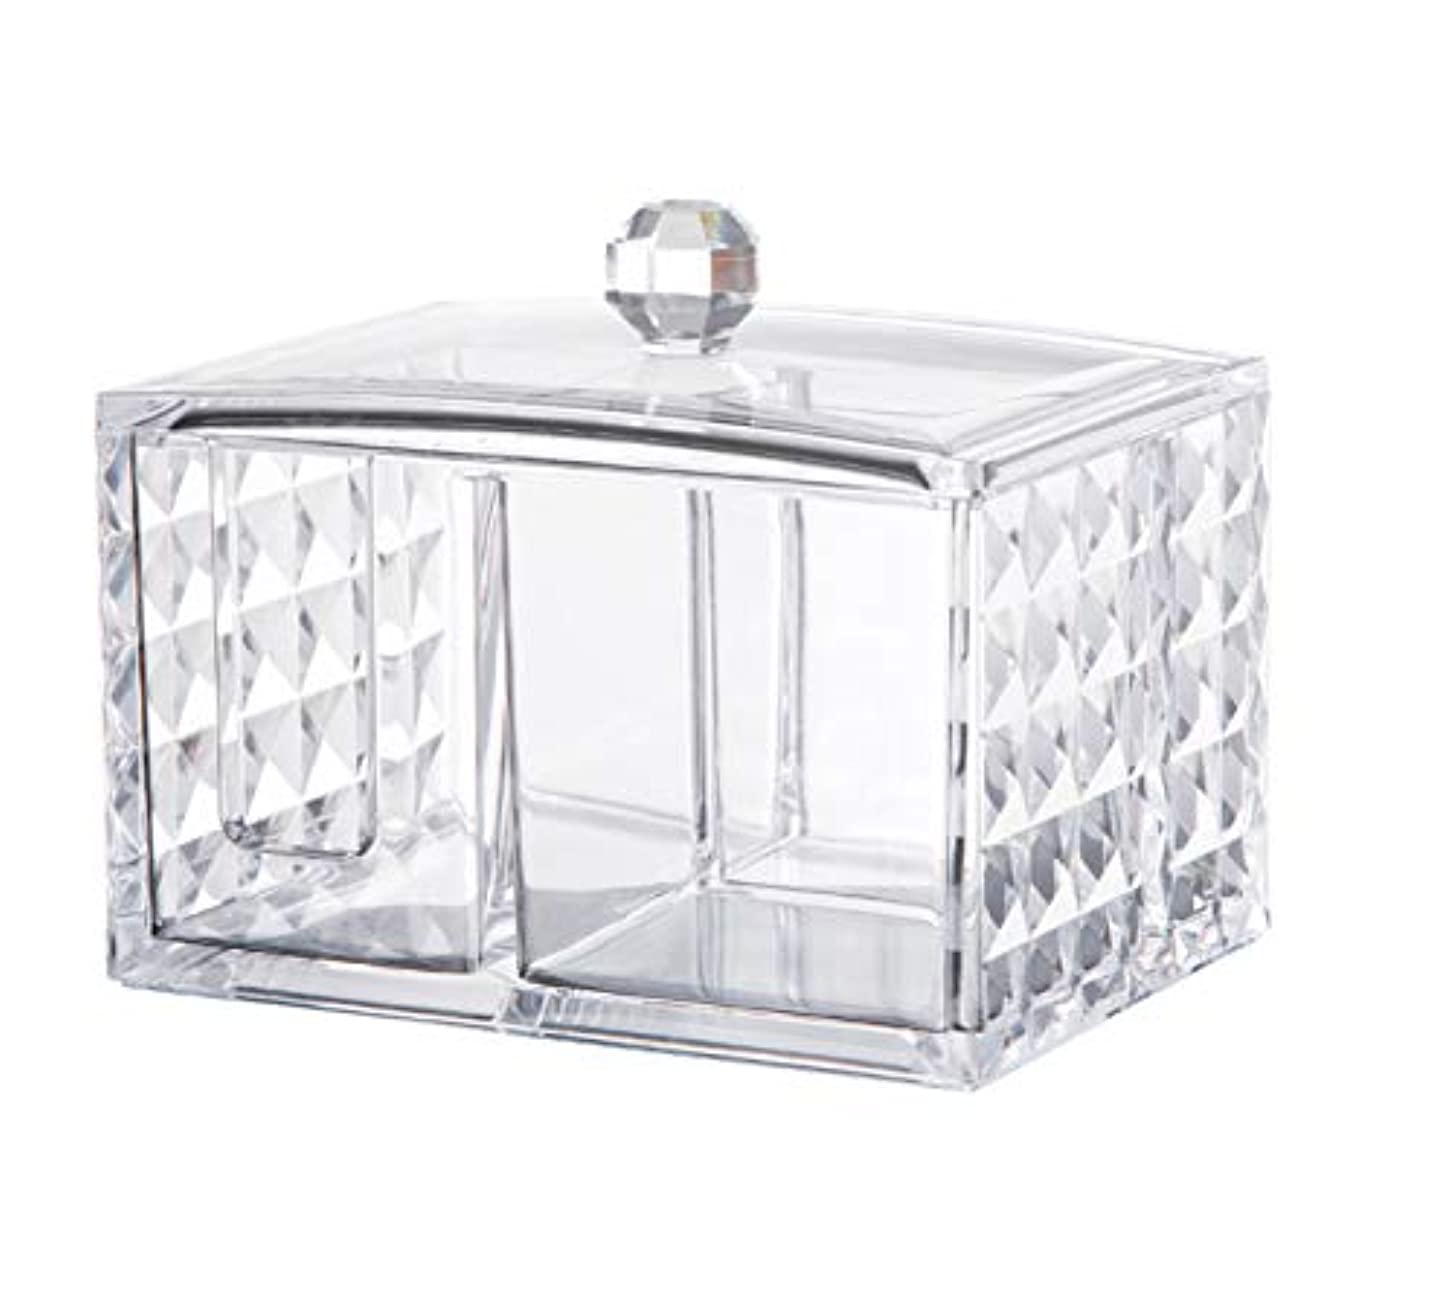 CUAFID アクリルケース コスメ収納ボックス コットン 綿棒 小物 メイクケース ジュエリーボックス 蓋付き アクリル製 透明 …